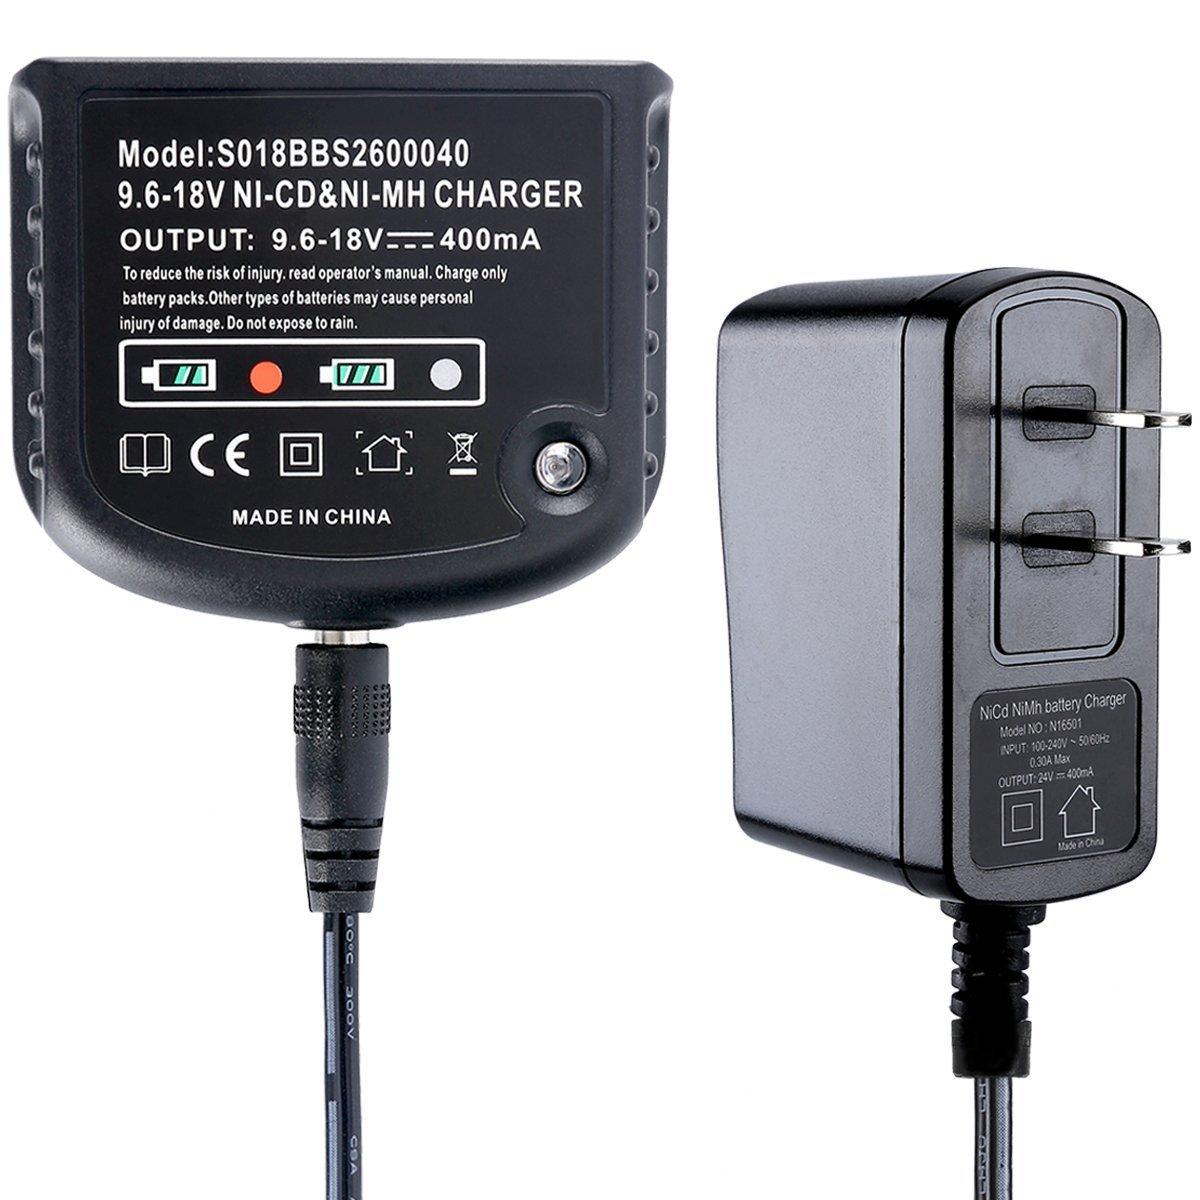 Biswaye 12V 14.4V 18V Dual Chemistry Battery Charger 90556254-01 for Black & Decker 9.6V-18V NiCad & NiMh Battery HPB18 HPB18-OPE FSB18 HPB14 FSB14 HPB12 FS12B HPB96 FSB96